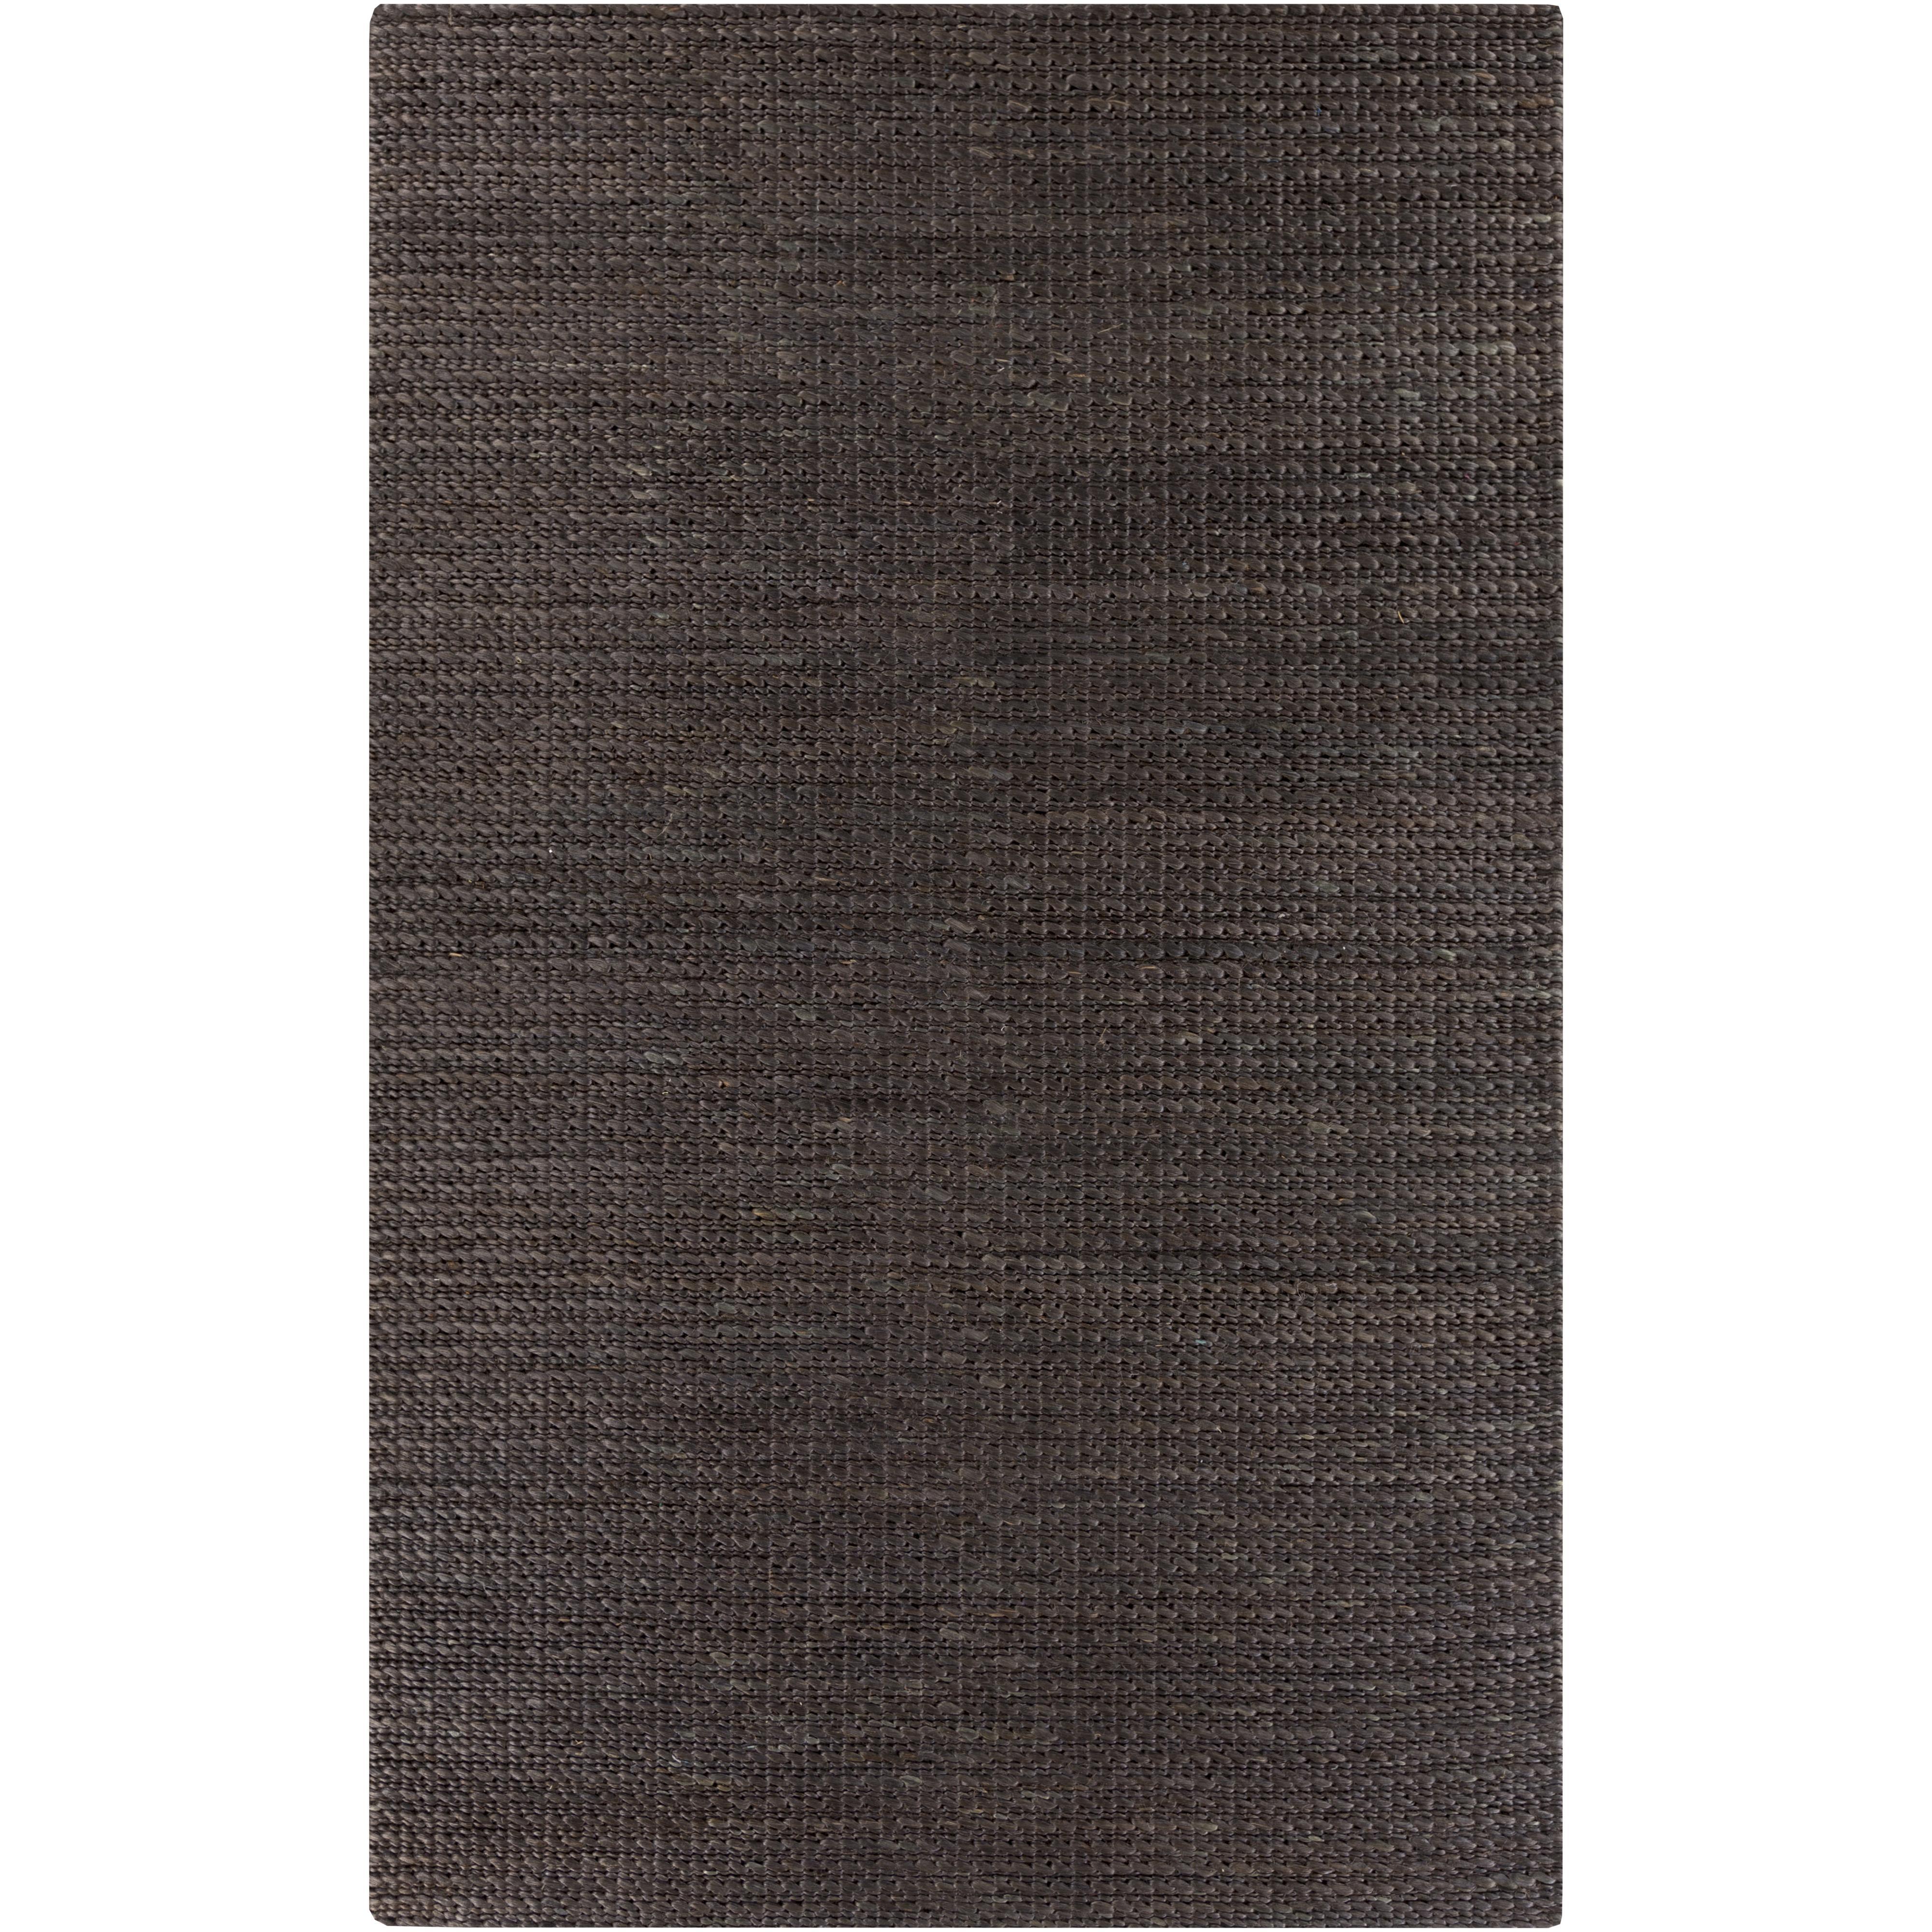 Surya Rugs Tropics 5' x 8' - Item Number: TRO1033-58